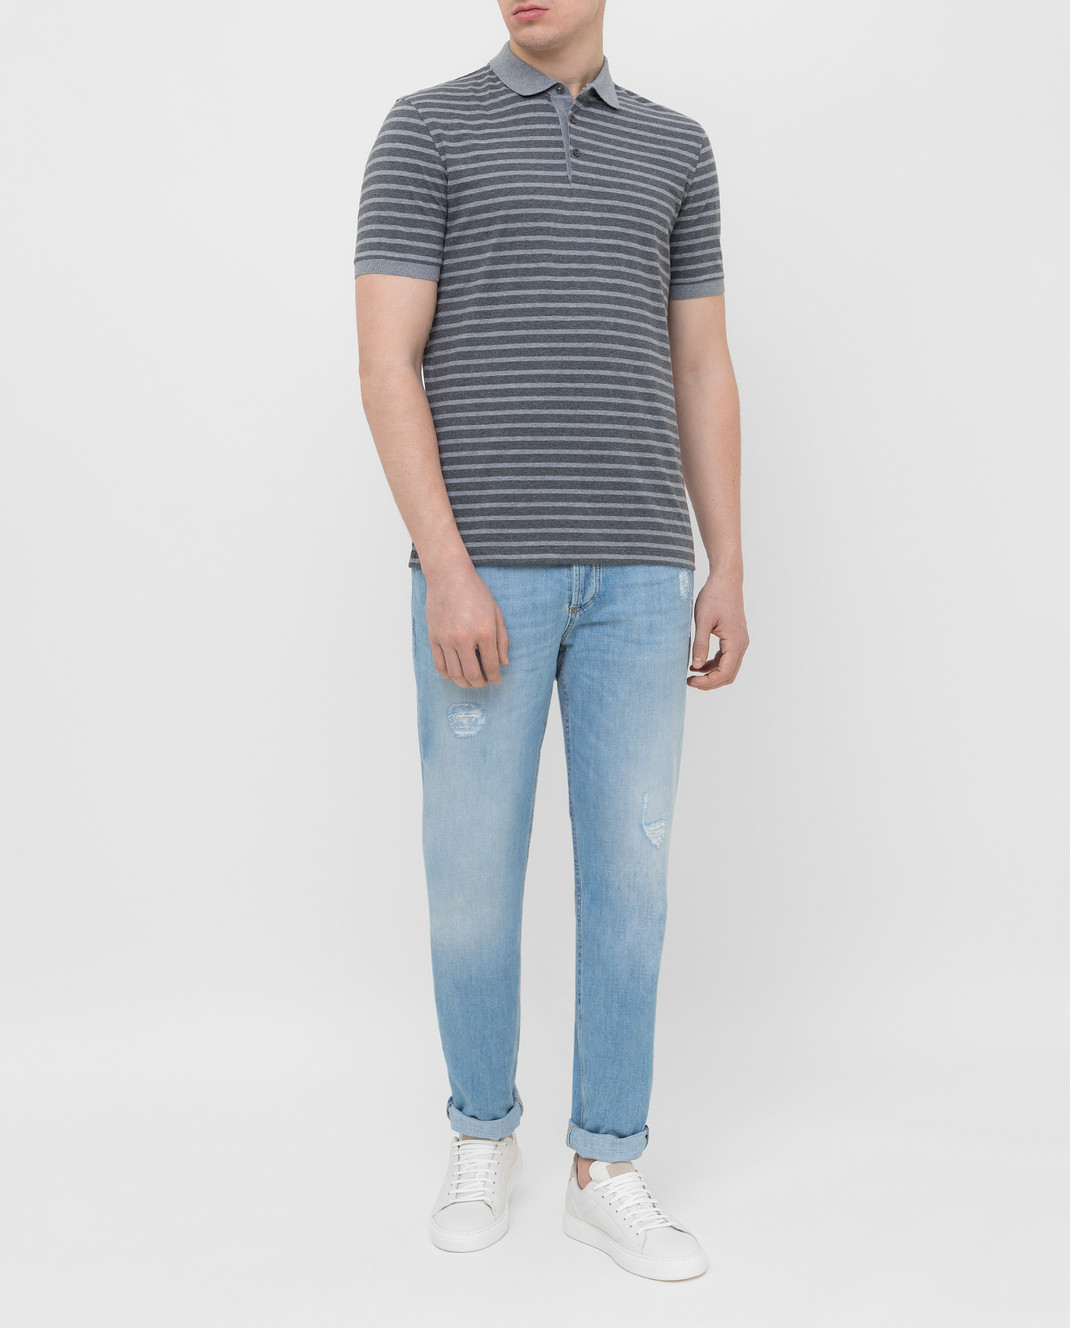 Brunello Cucinelli Голубые джинсы M0Z37D2360 изображение 2